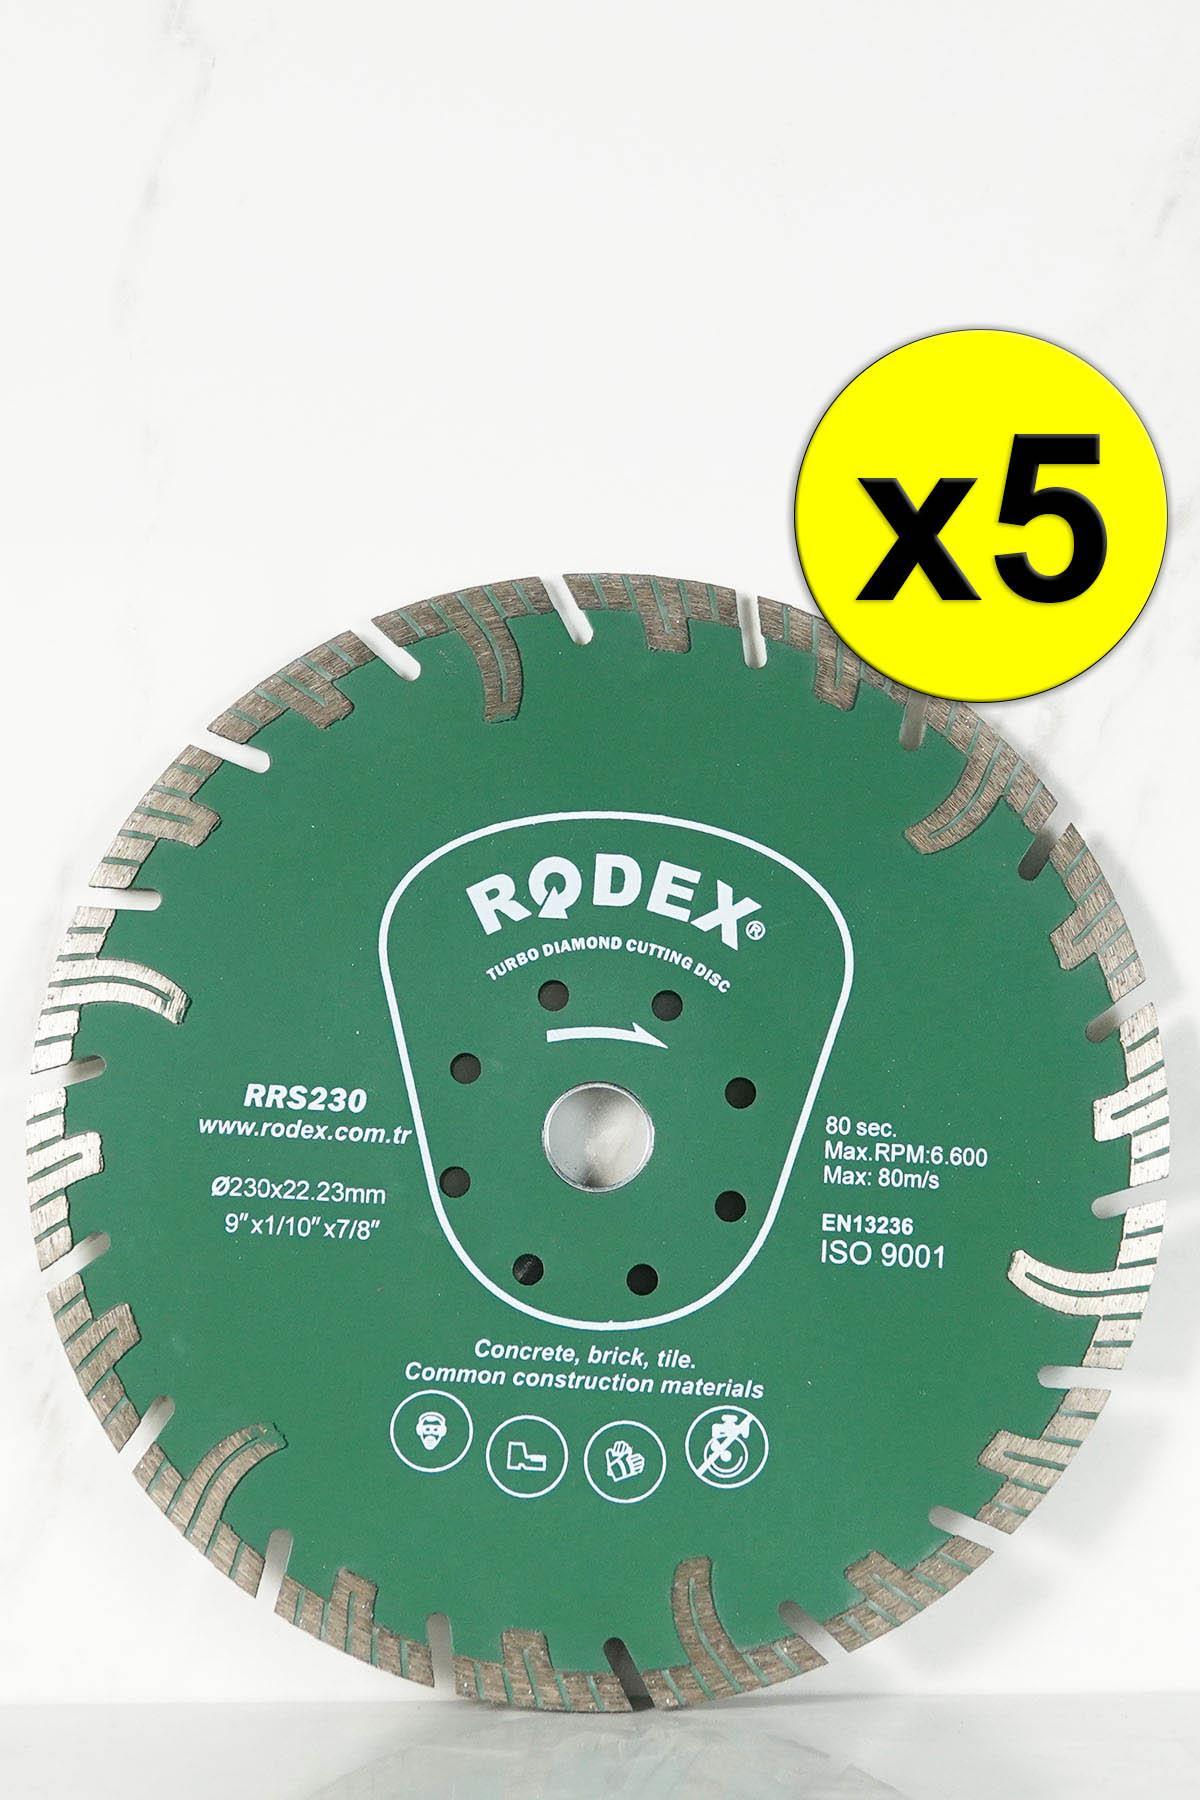 Rodex RRS230 Channel Turbo Diamond Cutting Disc for Marble, Brick, Granite, Stone 230mm 5 Pcs